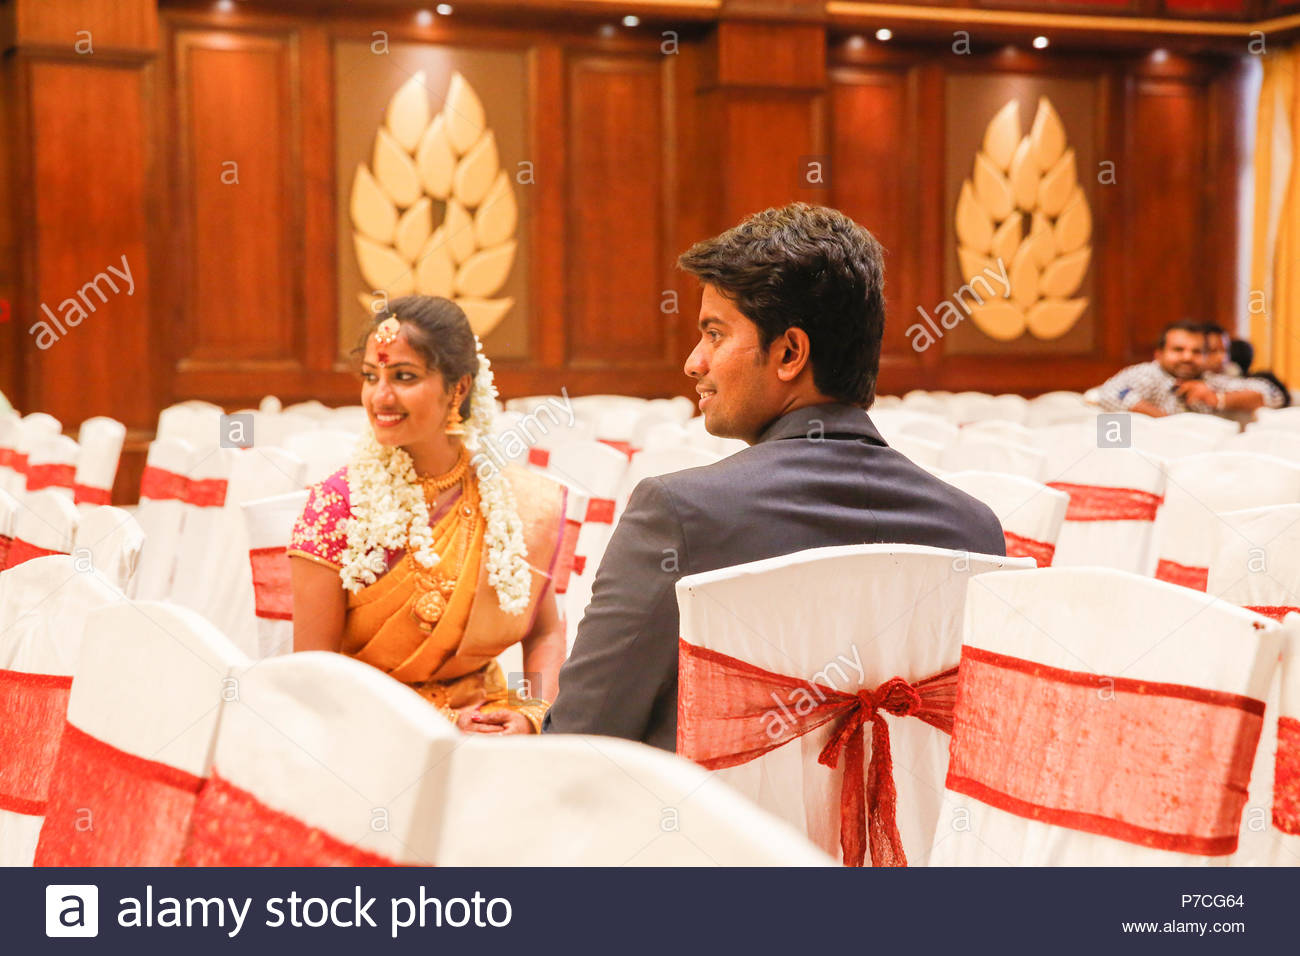 Puduchery Pondichery Tamil Nadu India September Circa 2017